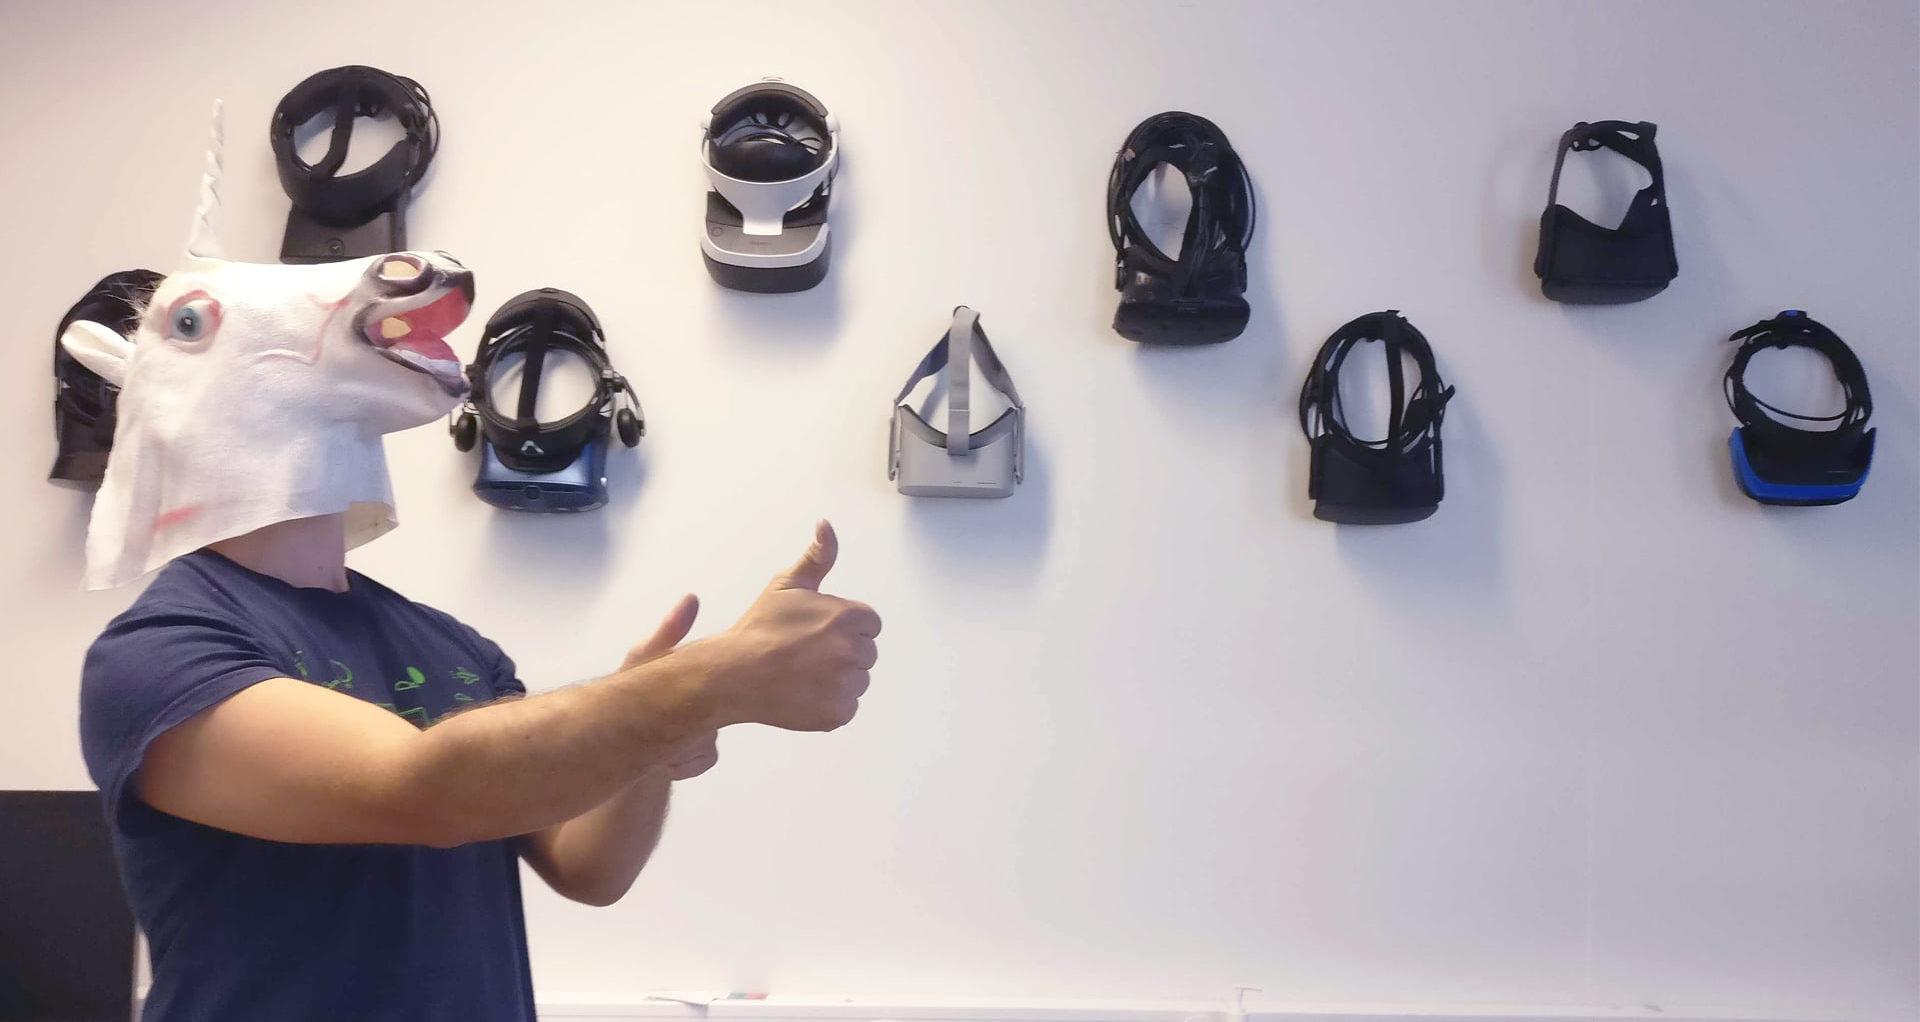 Jani Kaipainen, COO & VR продюсер в финском MeKiwi